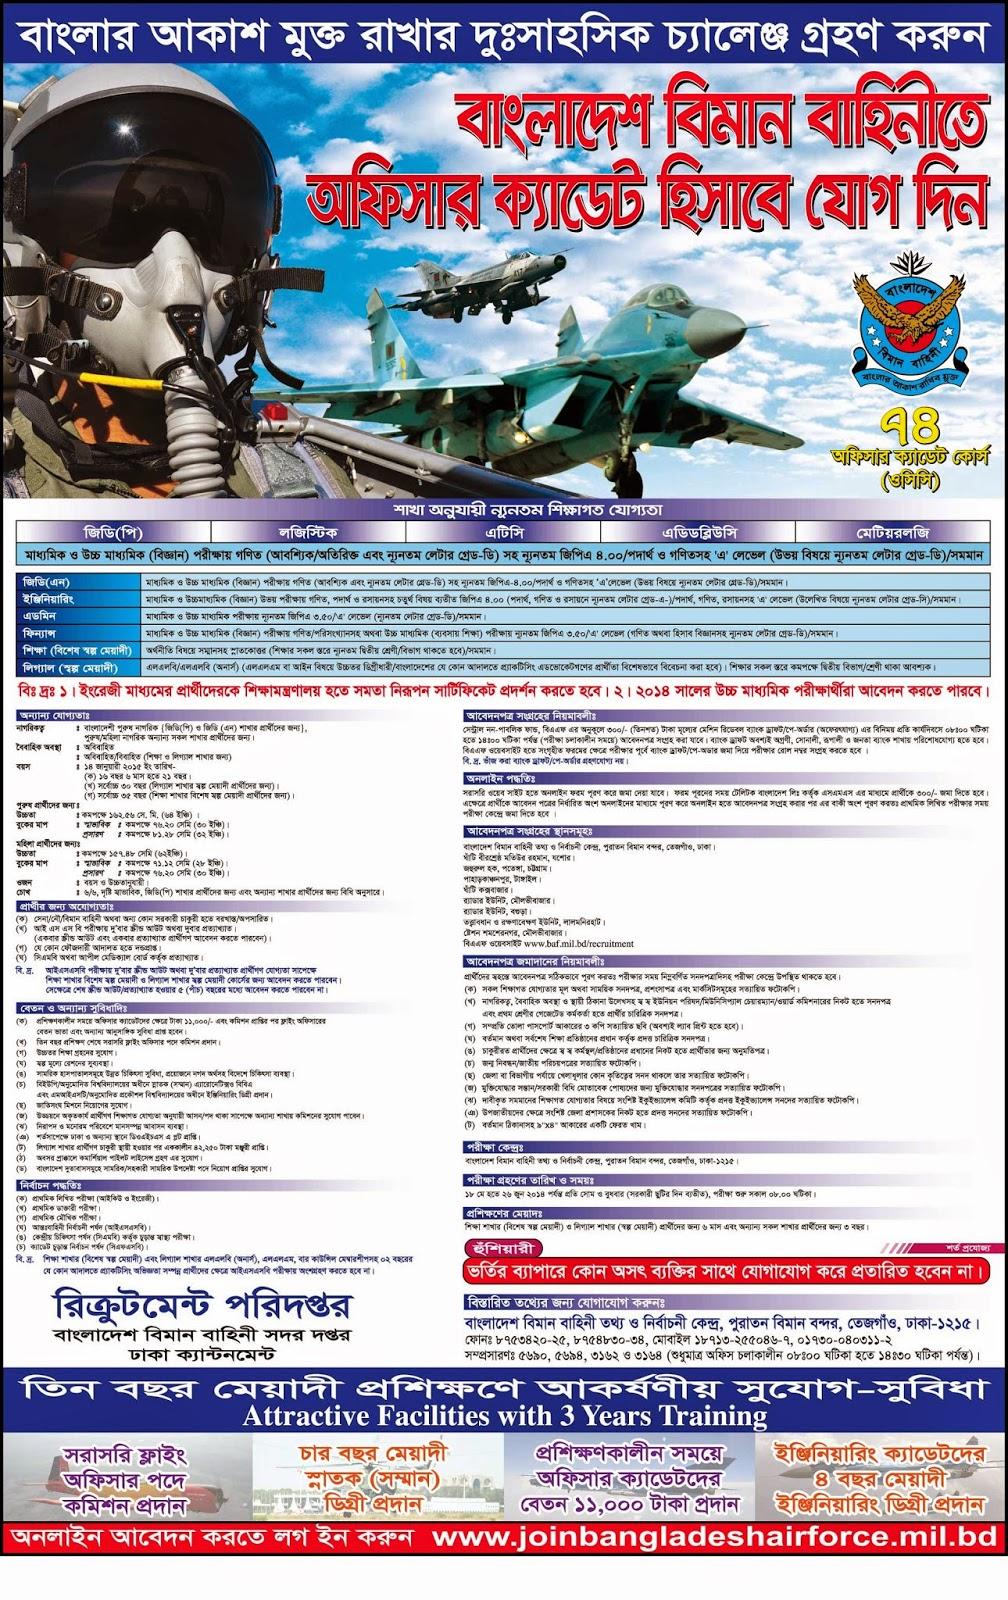 Bangladesh Air Force Circular 2014 OCC 74